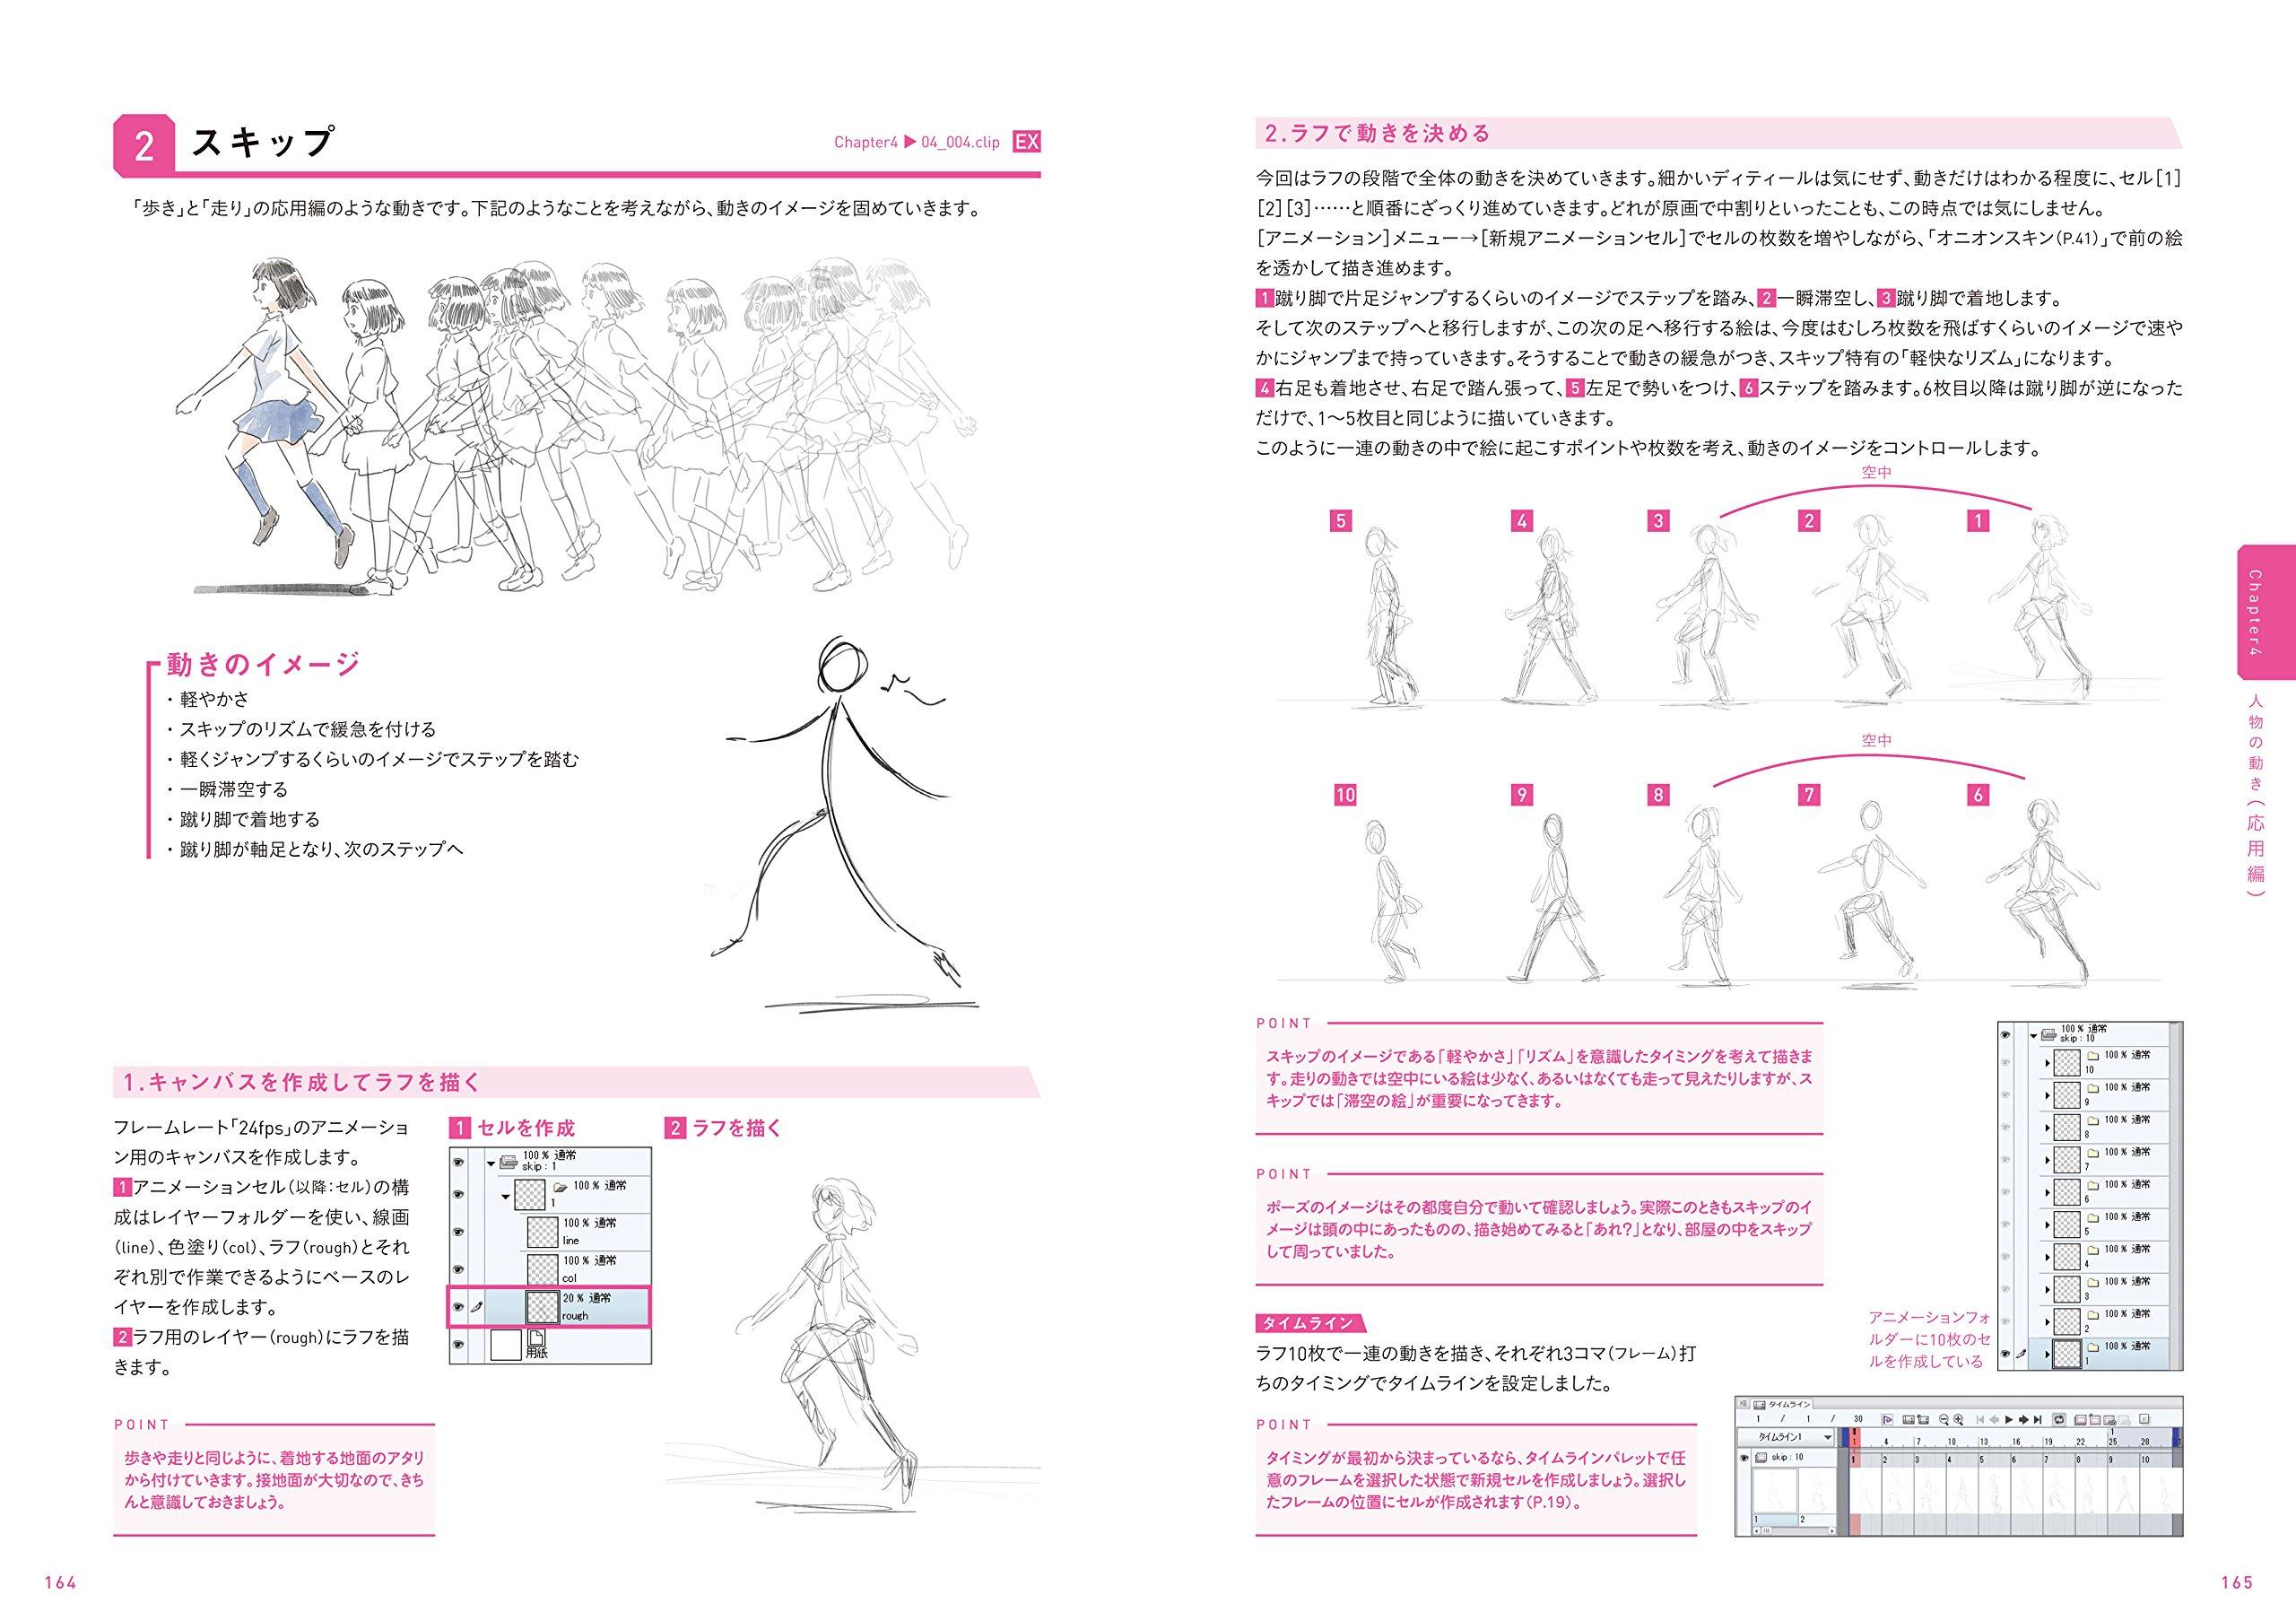 opentoonz アニメ 作り方